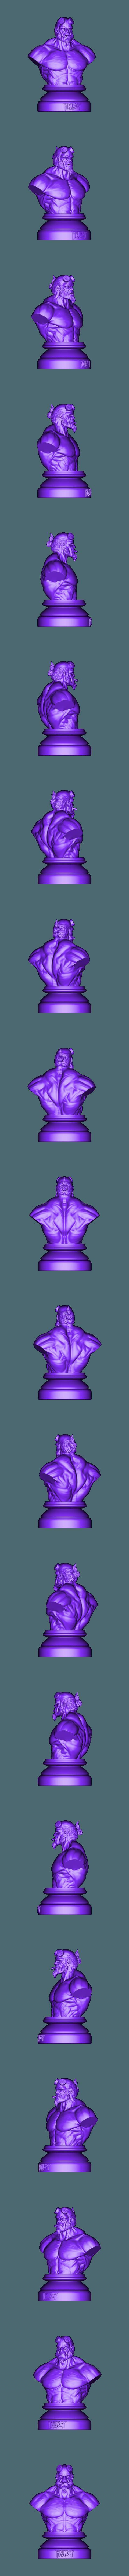 HELLBOYBUST148x200x114.stl Download STL file HELLBOY 2019 • 3D printable model, Bstar3Dart